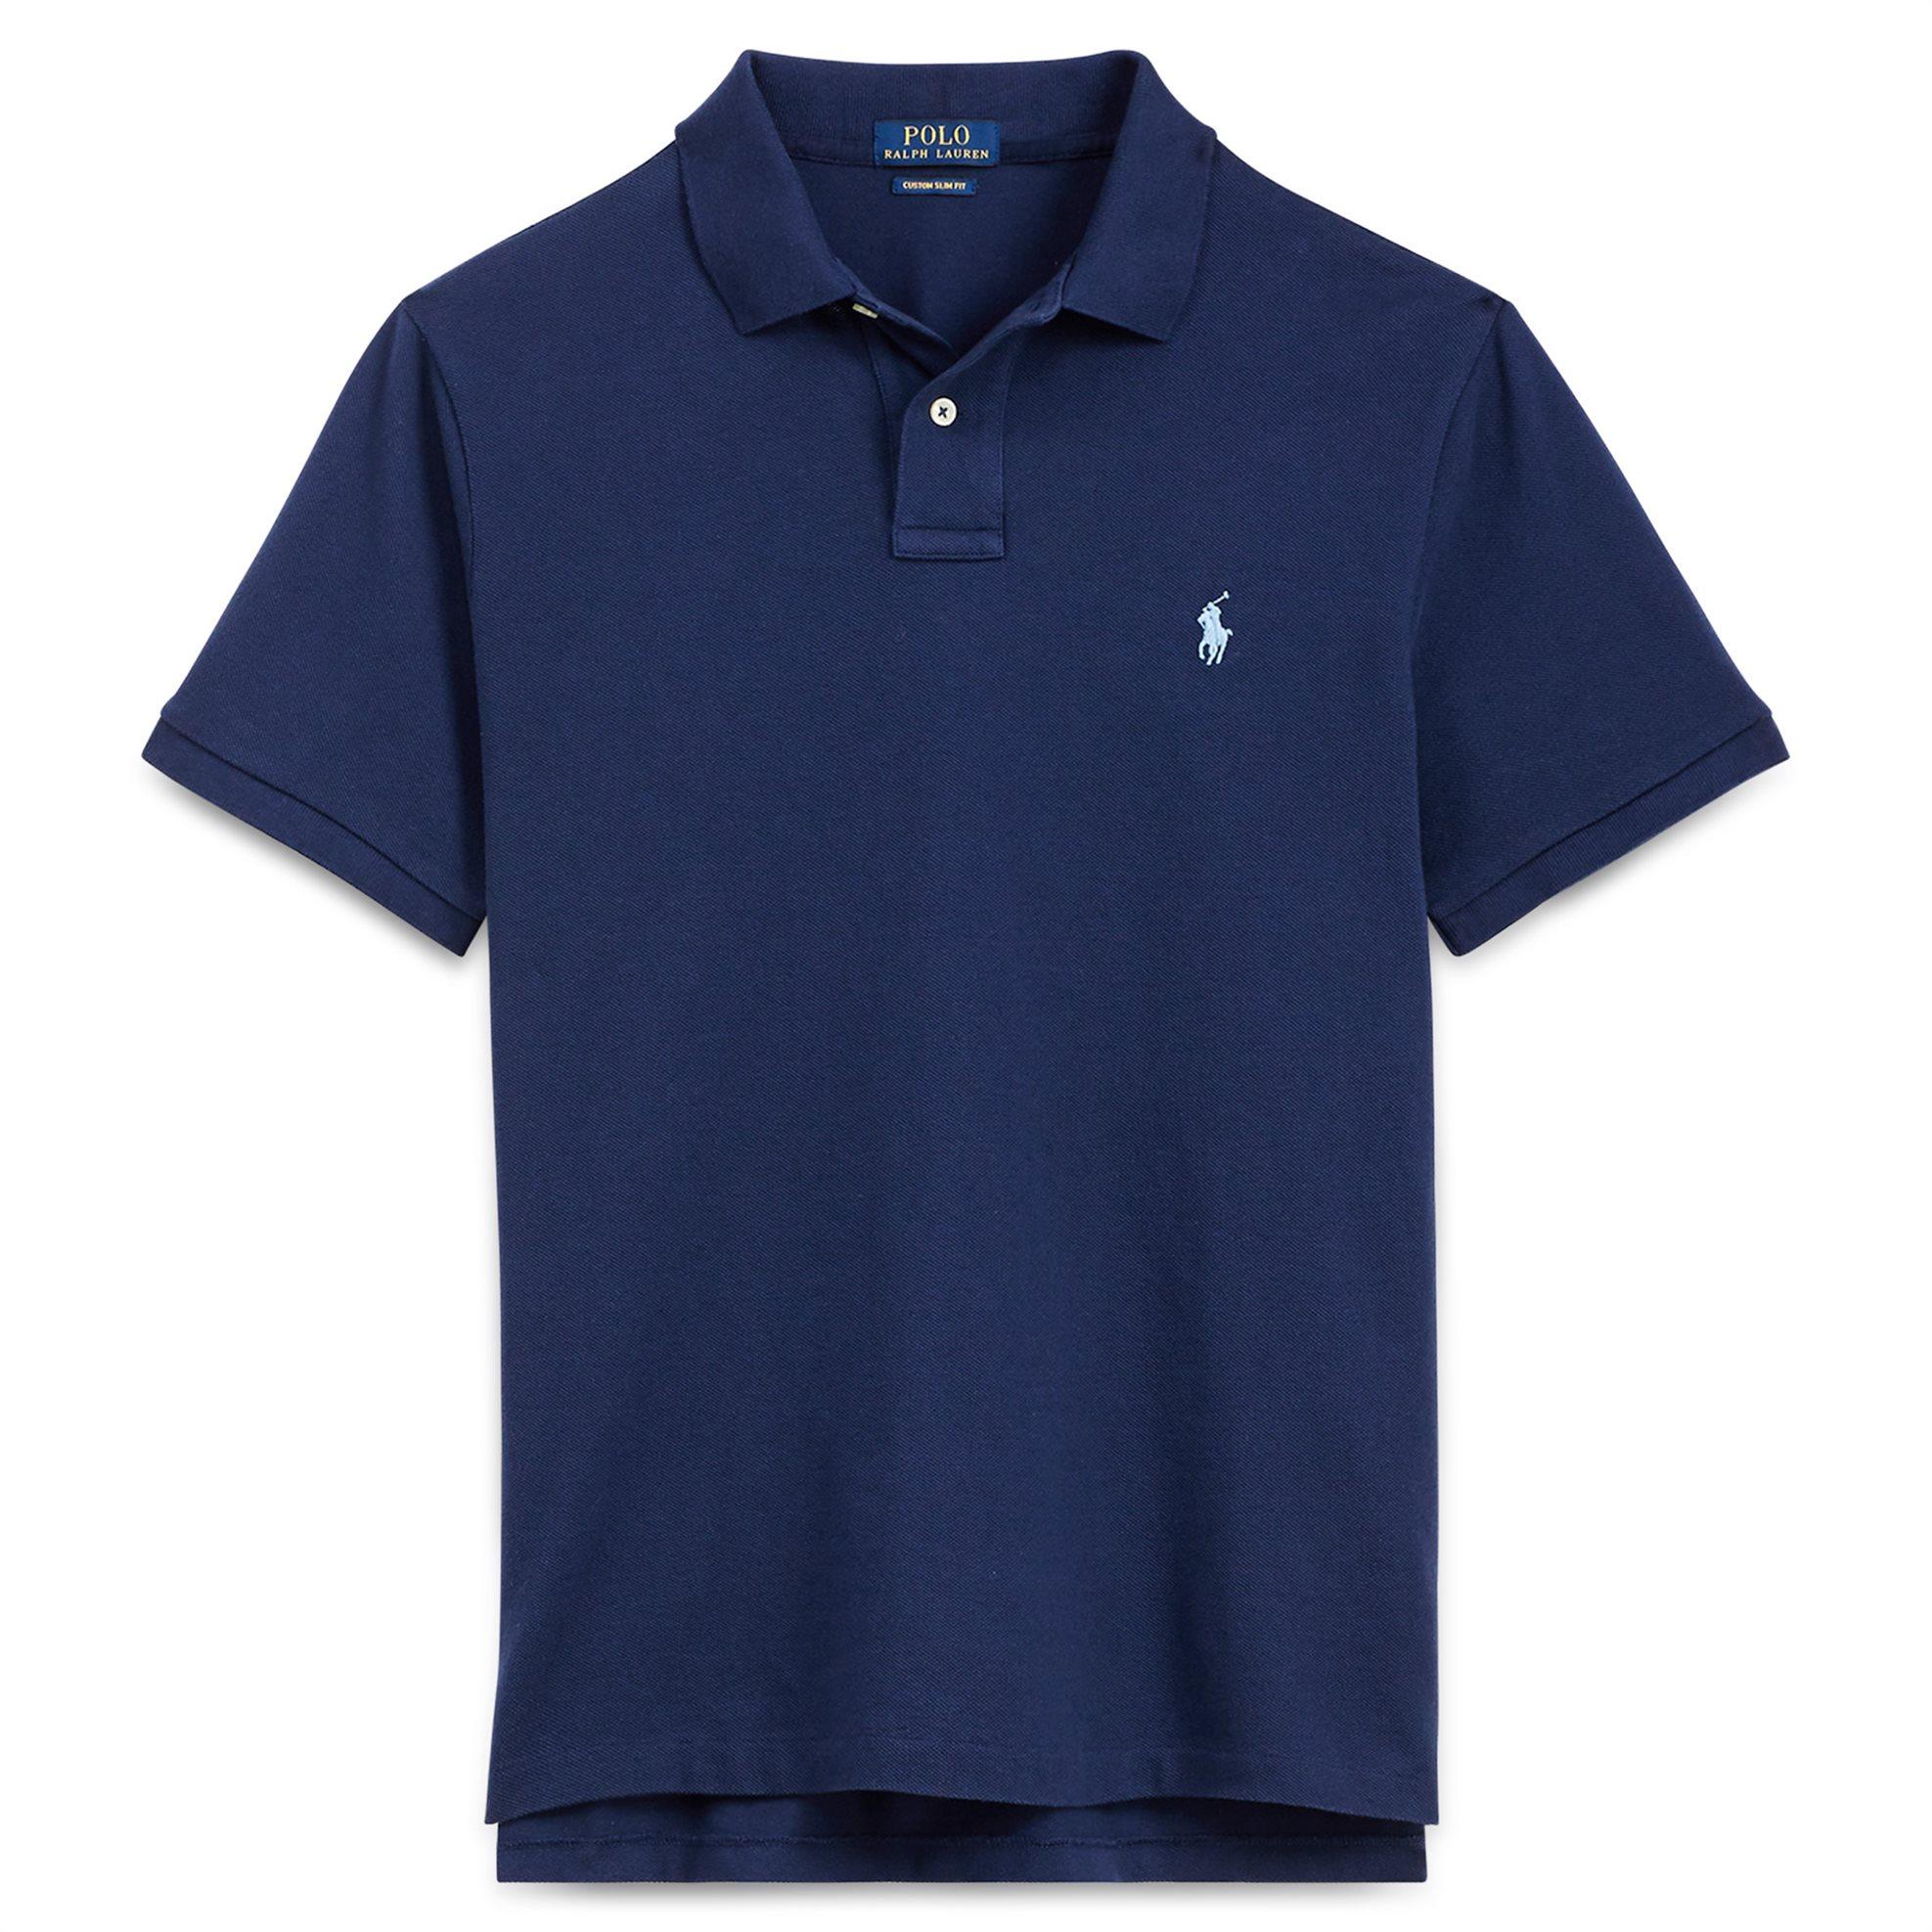 1647defa4108 Notos Polo Ralph Lauren ανδρική μπλούζα πόλο Custom Slim Fit Mesh Polo  Newport Navy - 710666998001 -